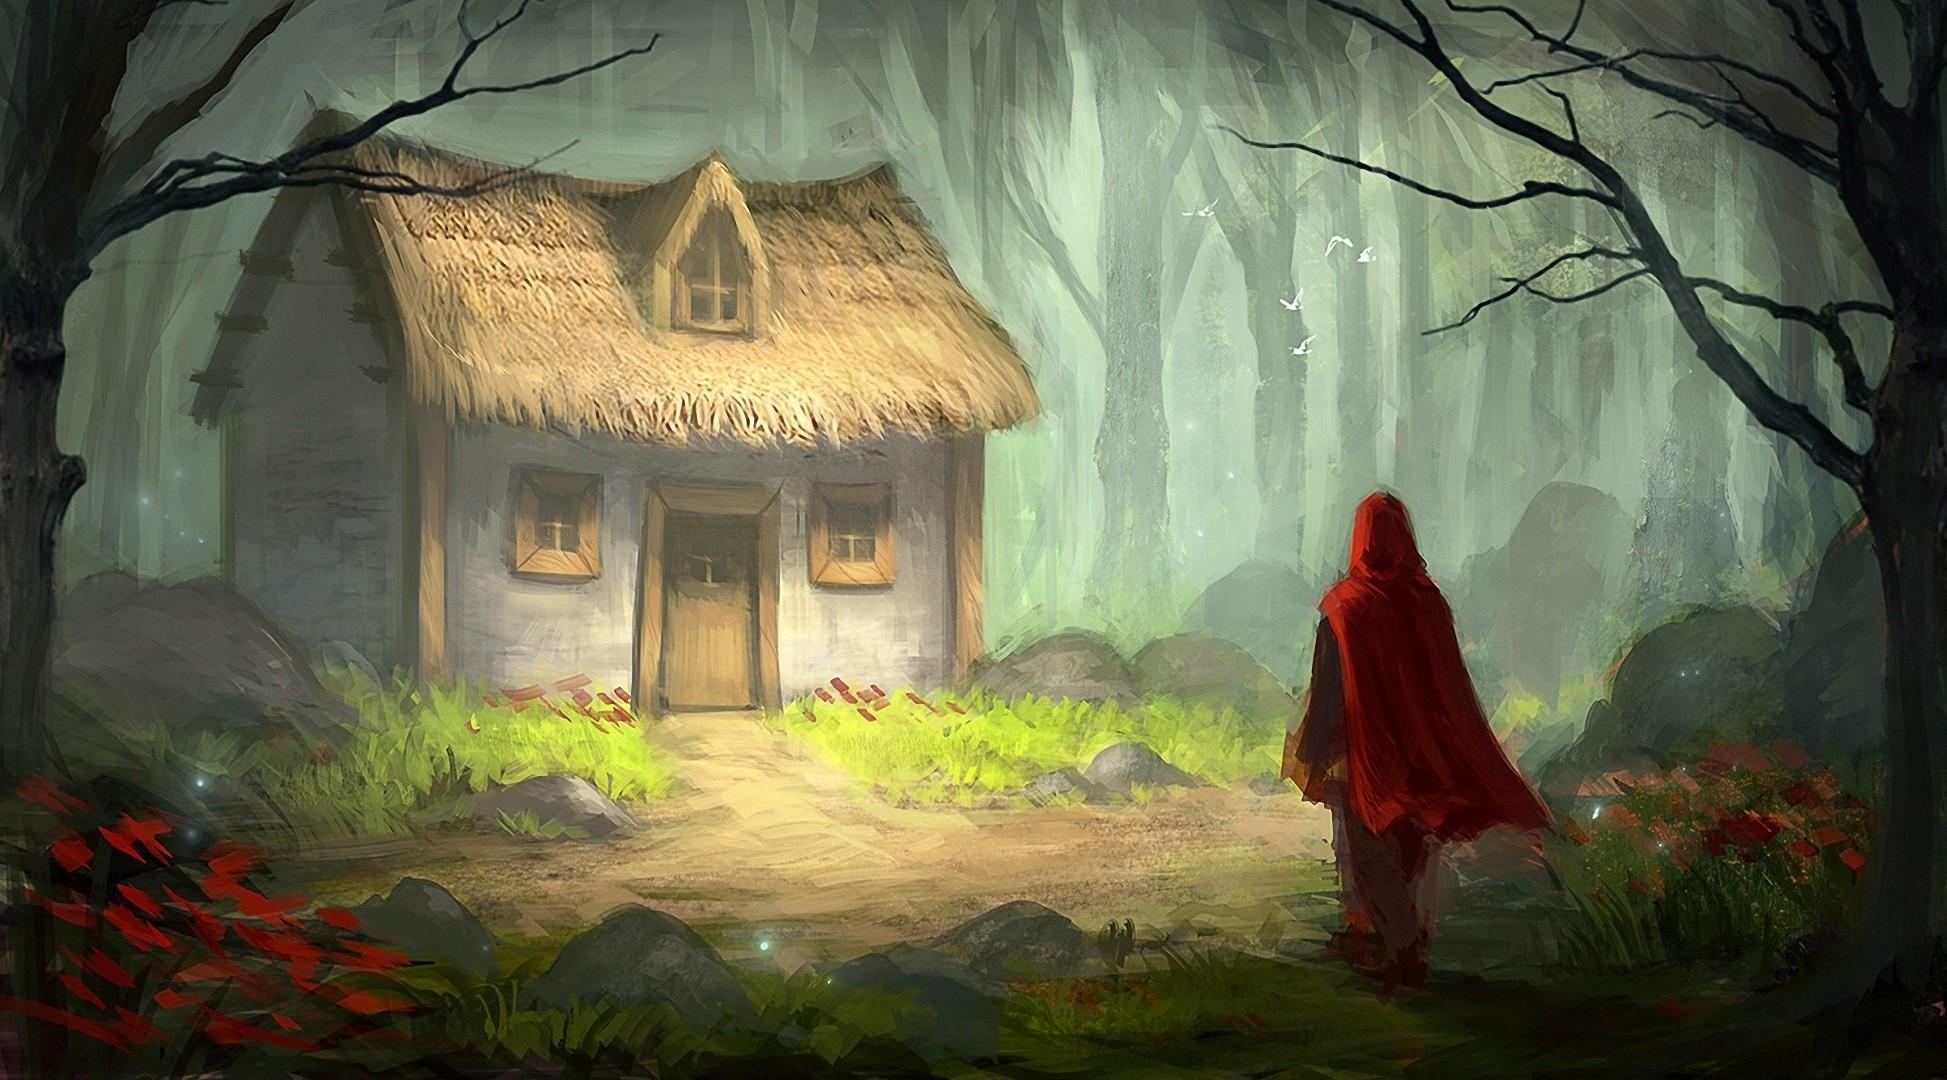 Sfondi Alberi La Pittura Foresta Arte Digitale Fantasy Art